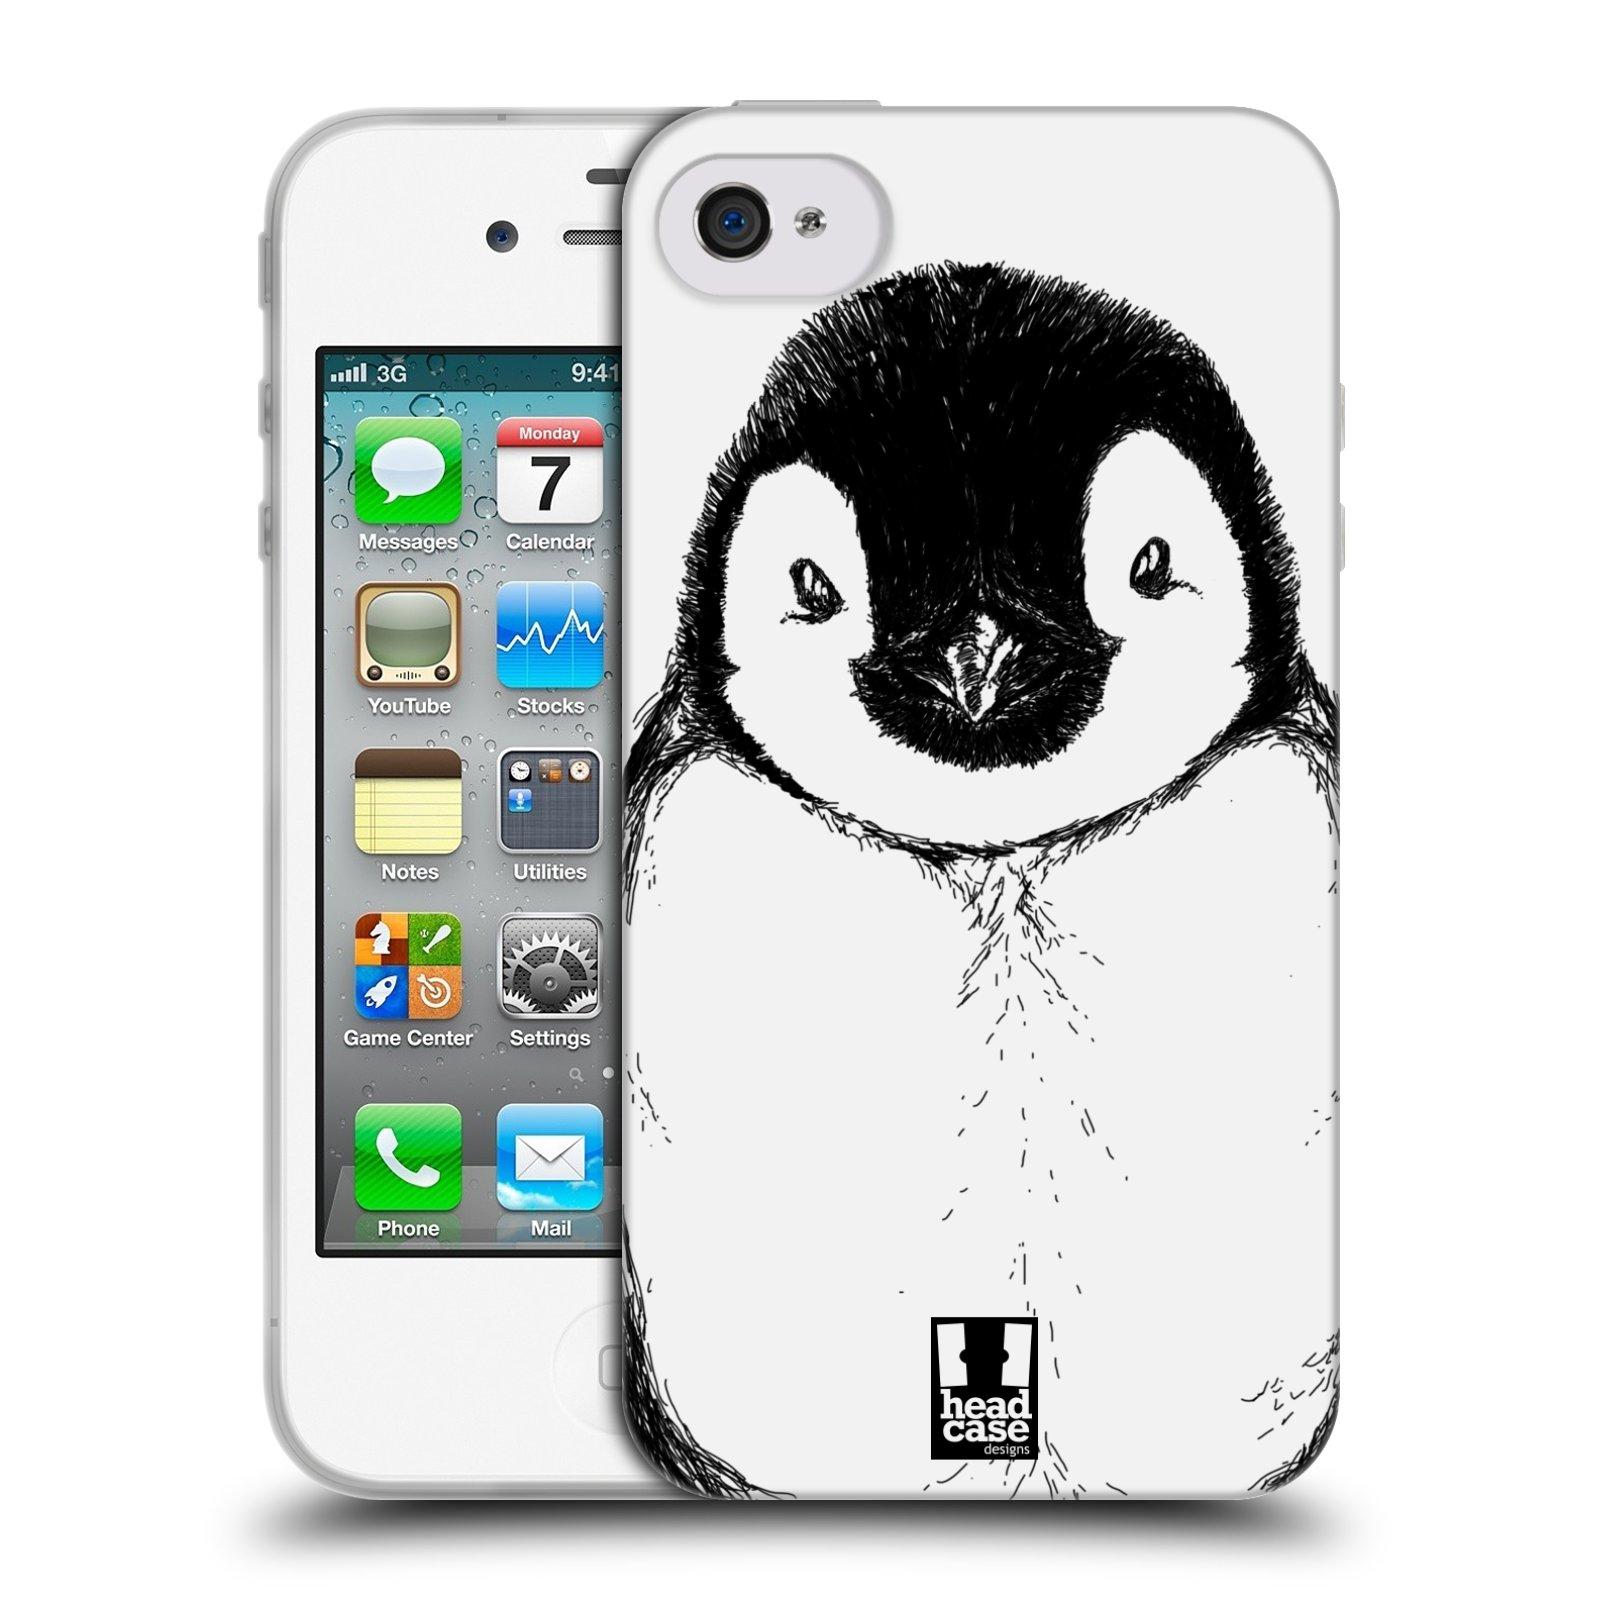 HEAD CASE silikonový obal na mobil Apple Iphone 4 4S vzor Kreslená zvířátka  černá a bílá tučňák b5504a23d64